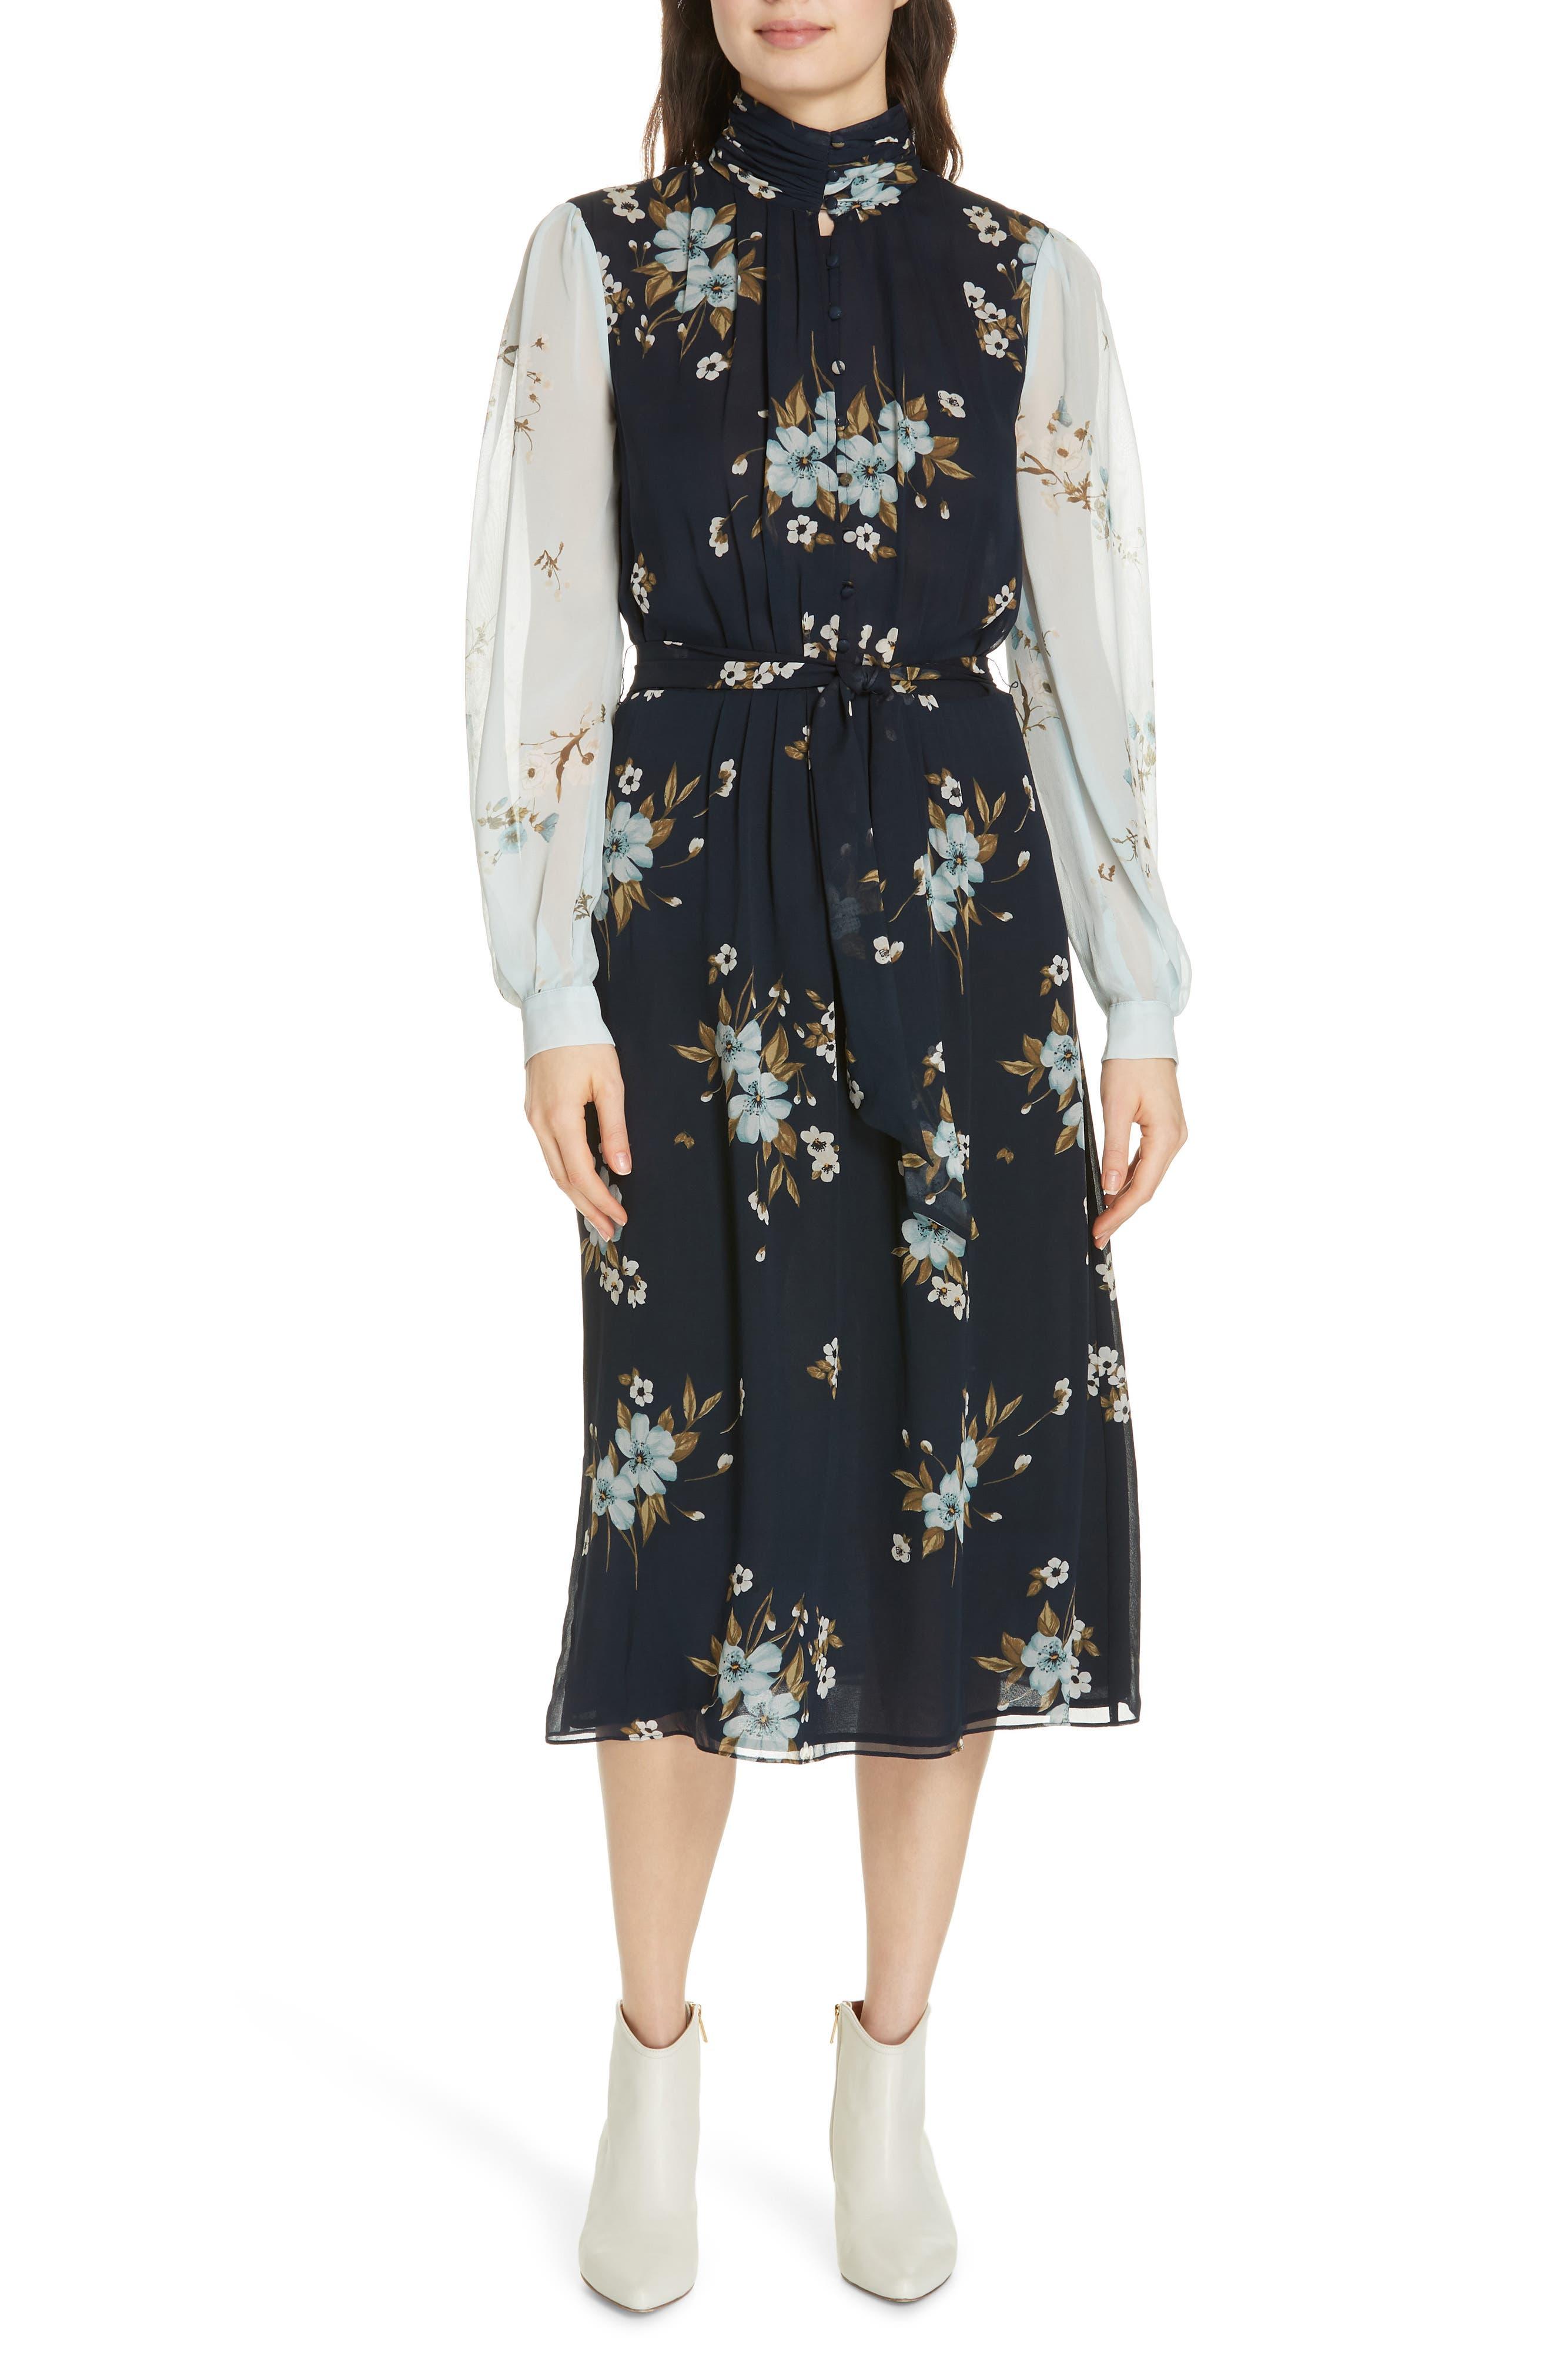 JOIE, Abbryana Silk Chiffon High Neck Dress, Main thumbnail 1, color, 440